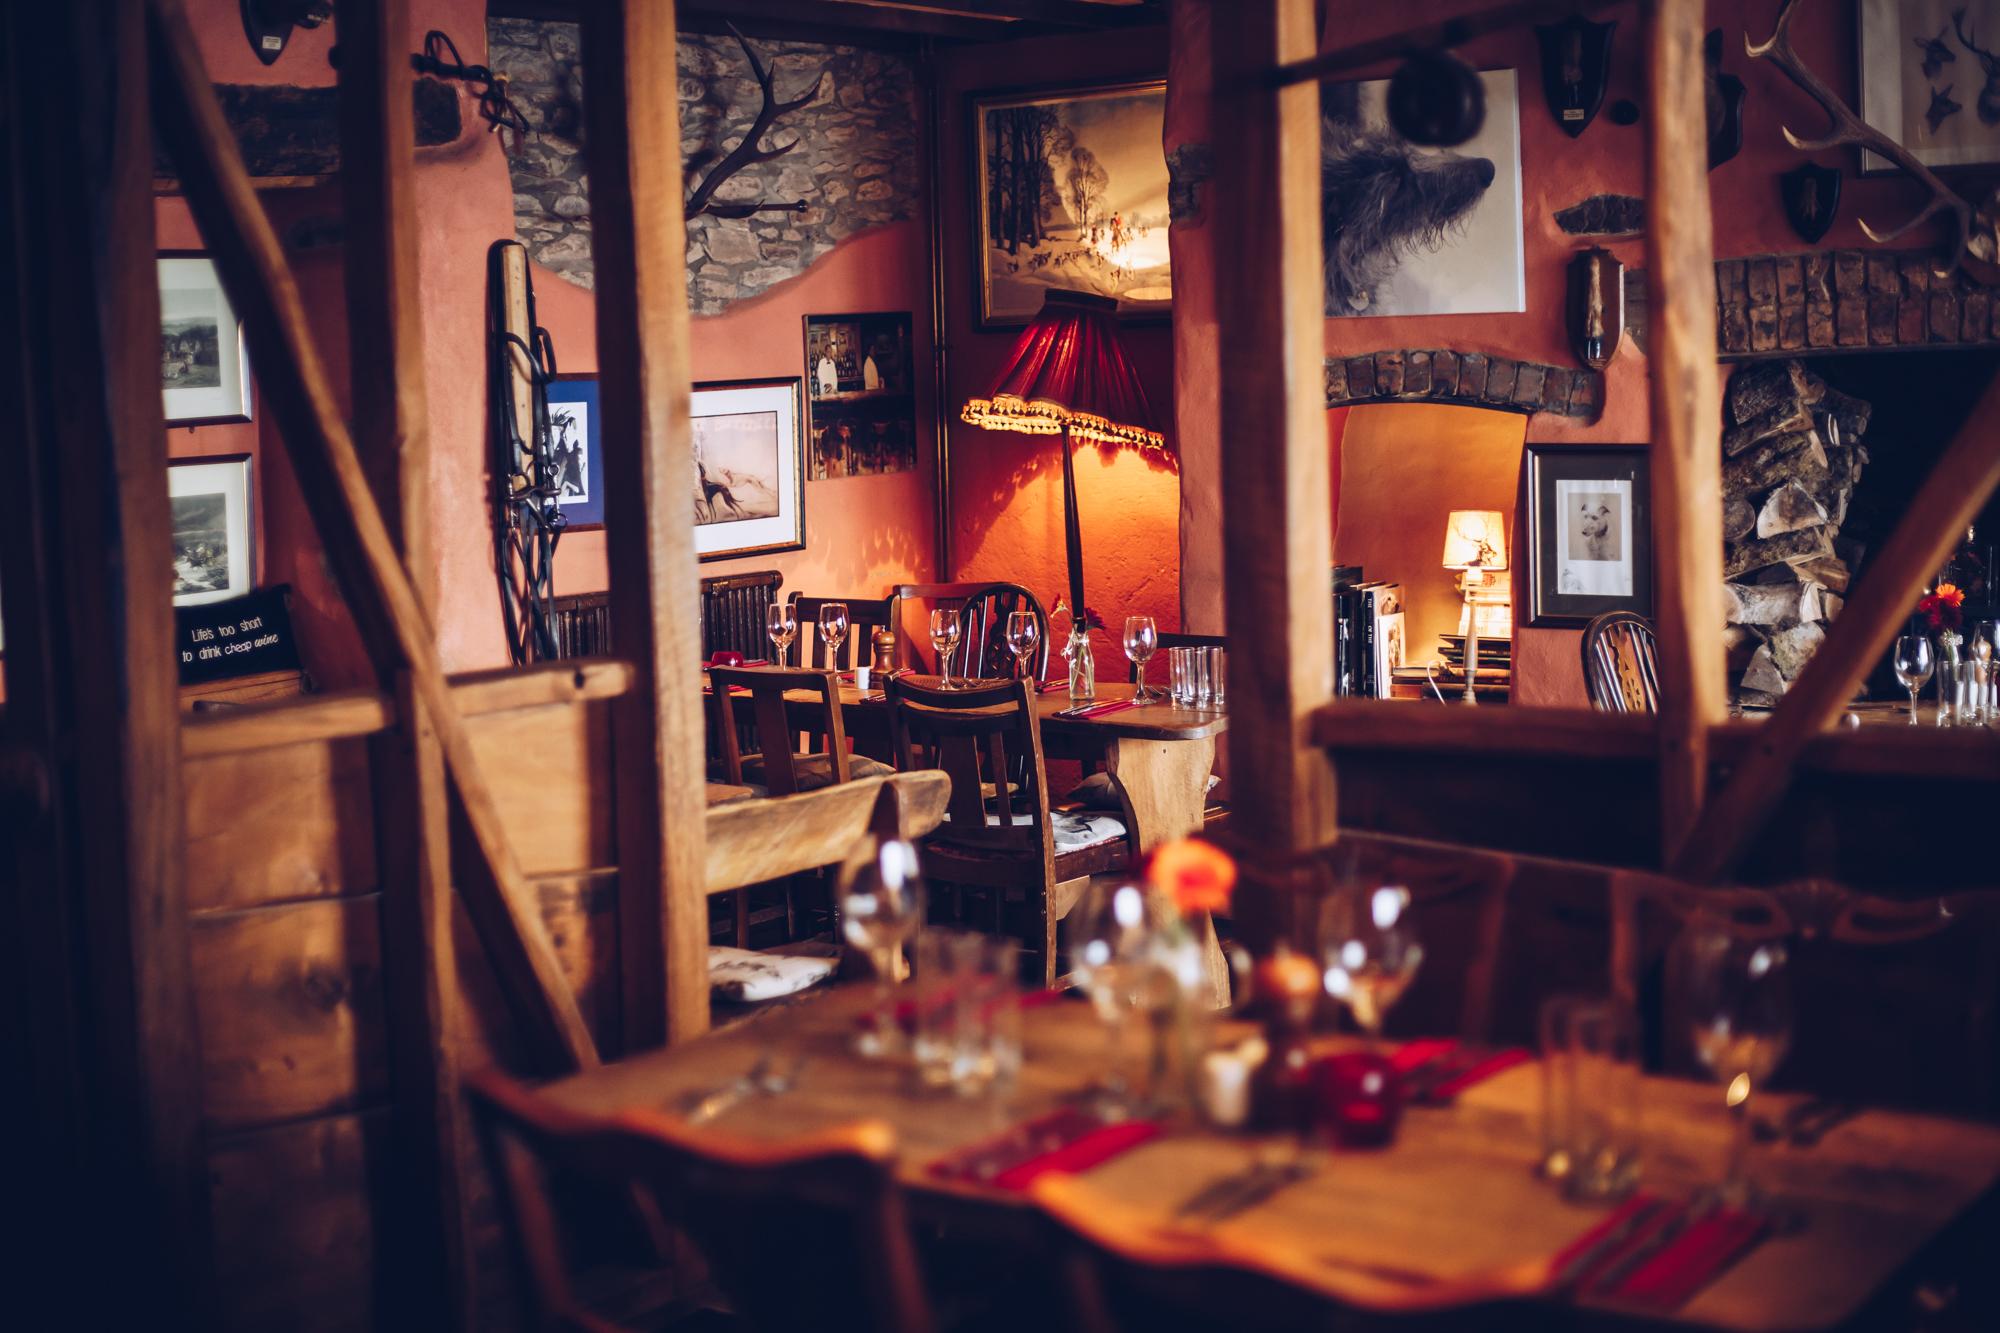 Woods Bar and Restaurant